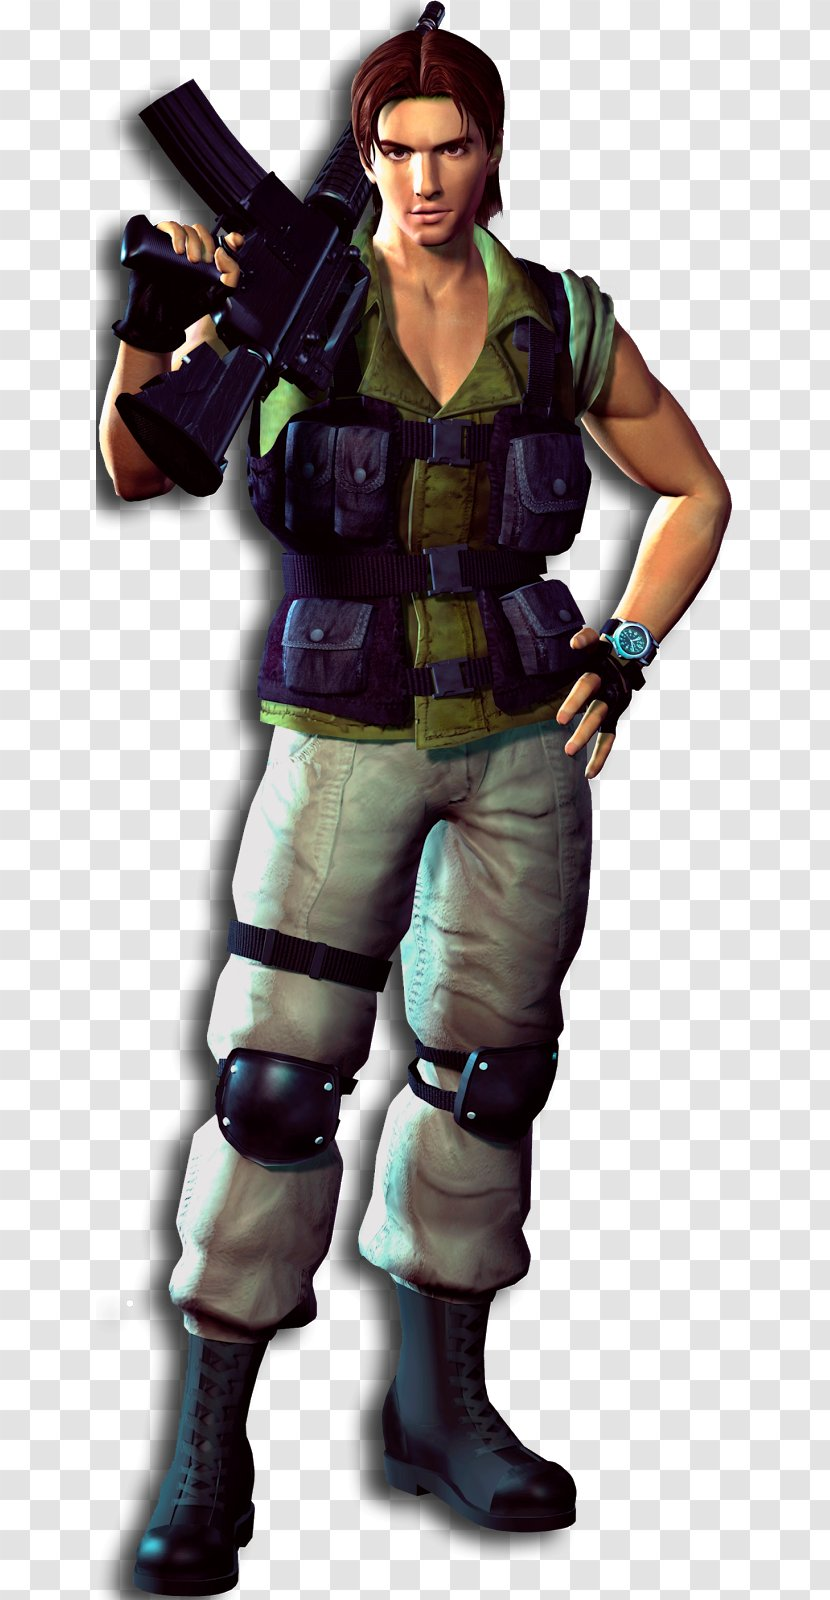 Resident Evil 3 Nemesis Zero Carlos Oliveira Transparent Png